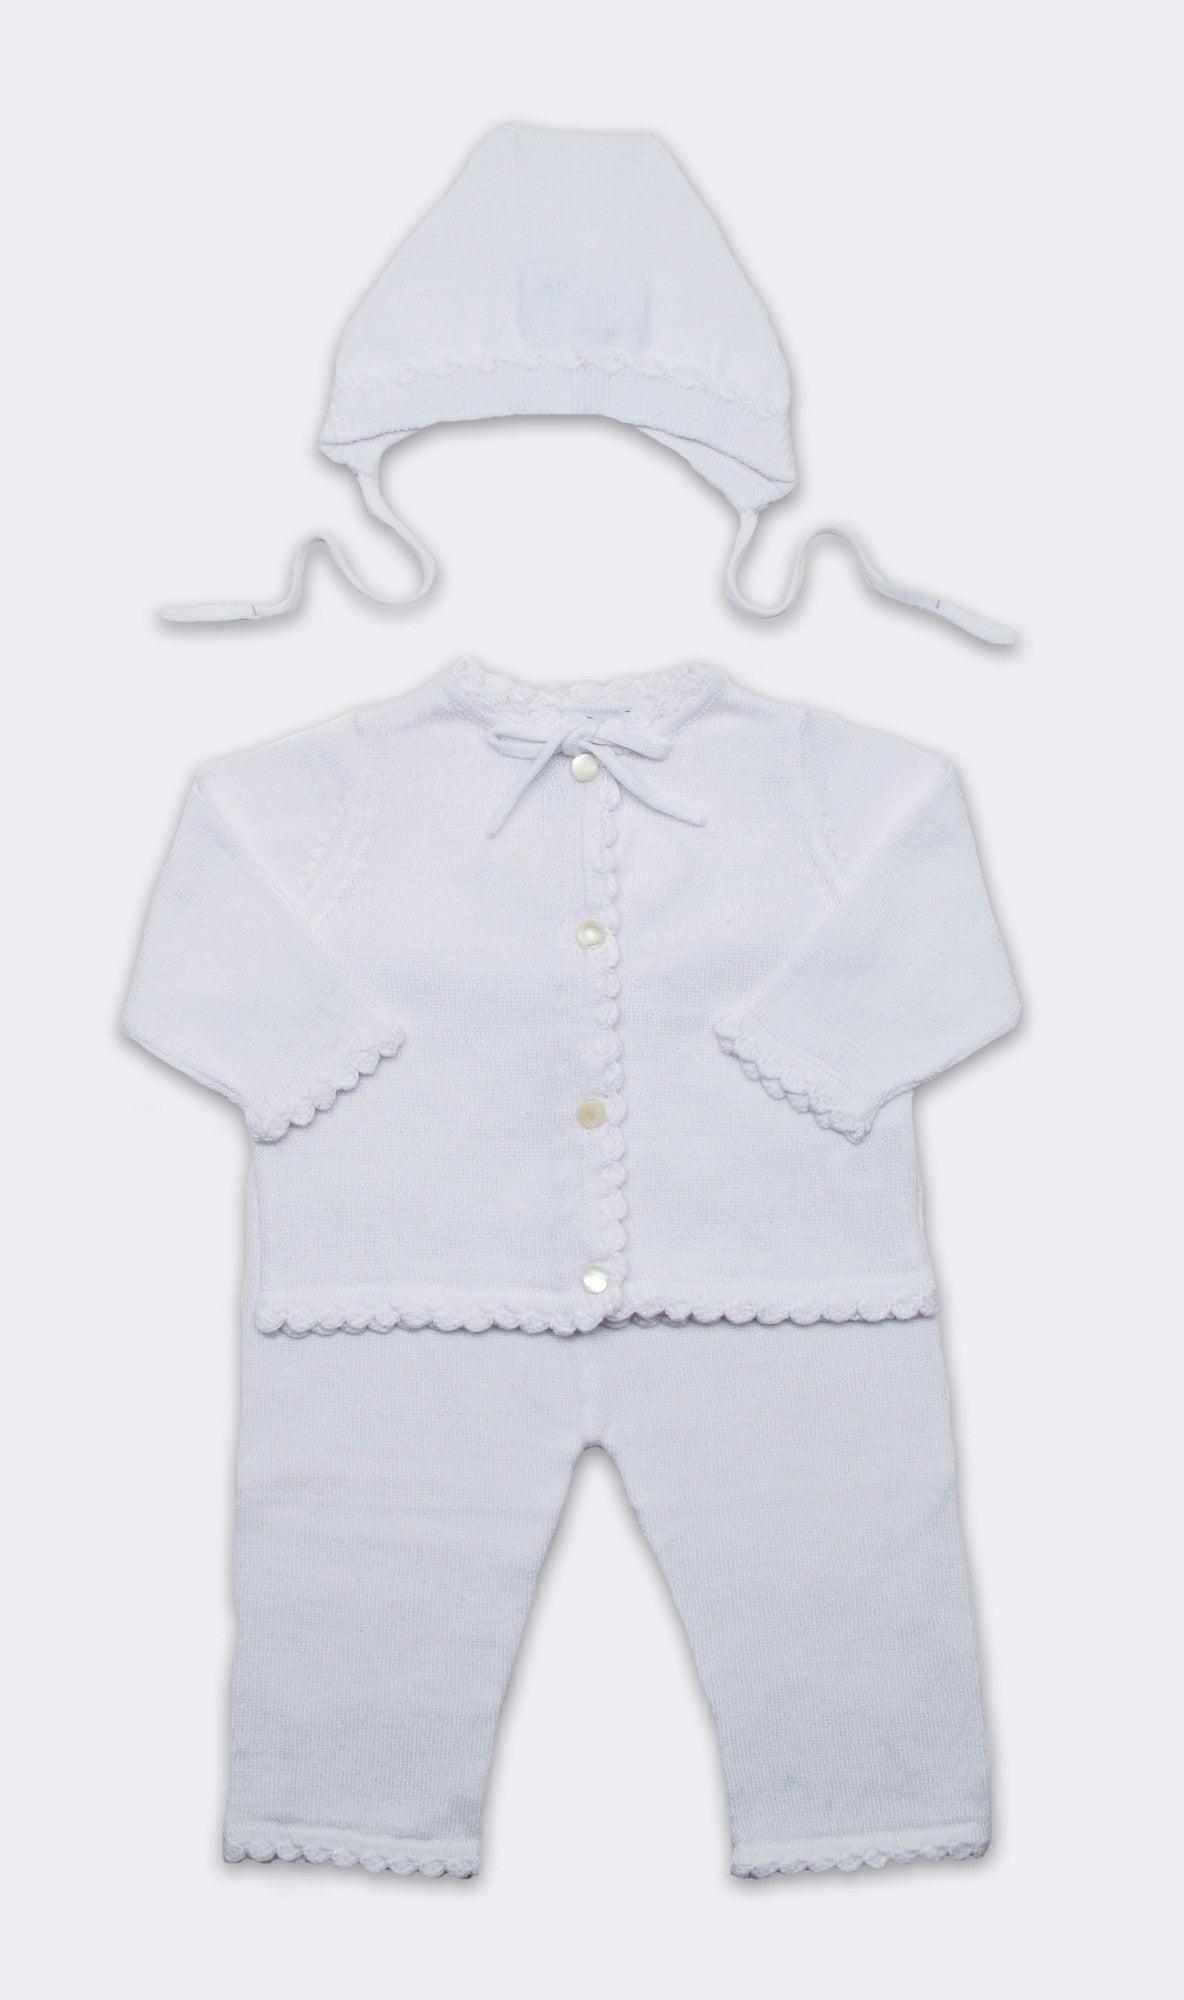 Cotton Crochet Layette Set in White